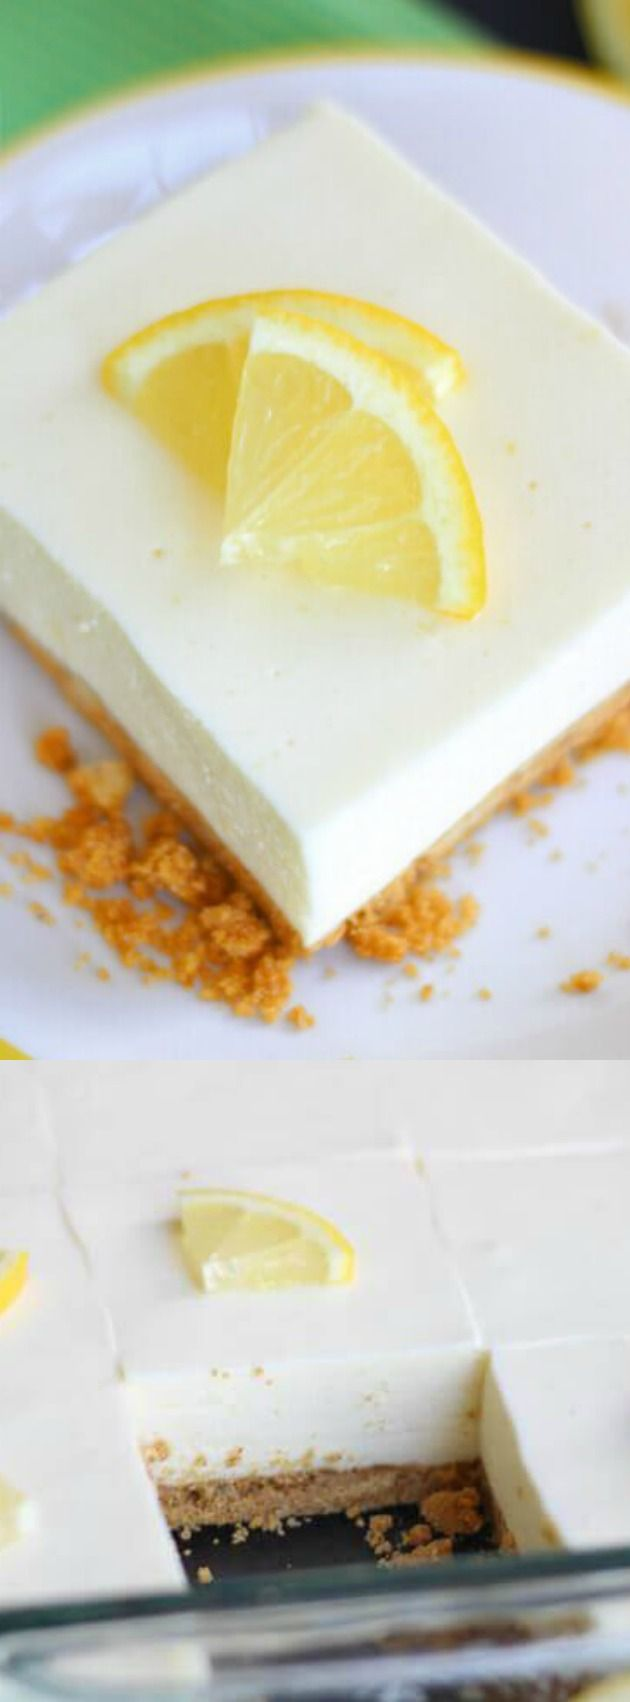 This No-Bake Lemon Jello Cheesecake recipe from Leesh & Lu's Recipe Box is light, lemony and has the perfect buttery, sugary graham cracker crust!